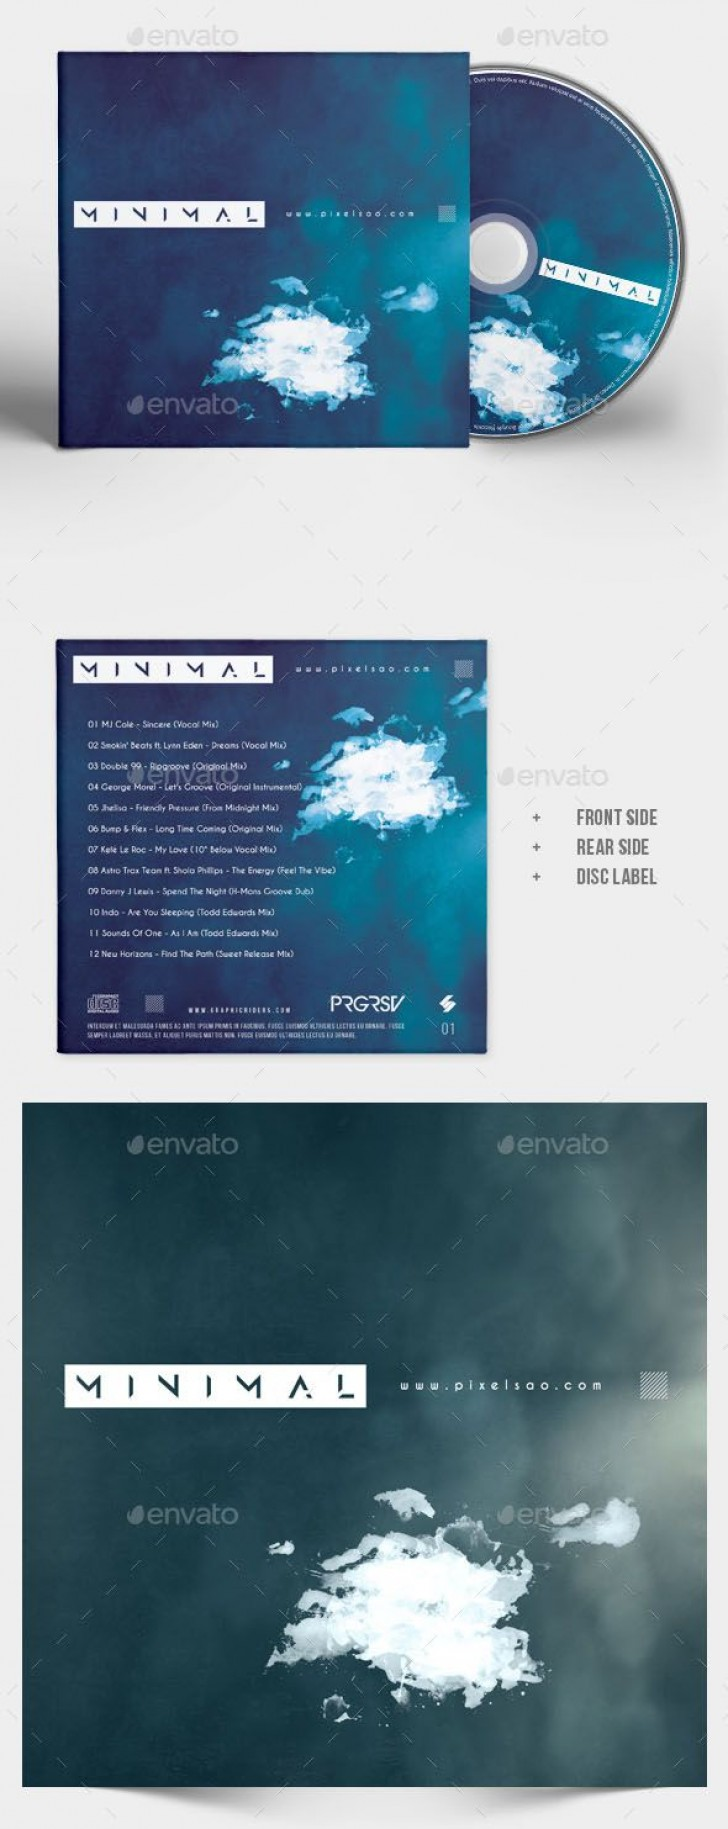 003 Sensational Wedding Cd Cover Design Template Free Download 728